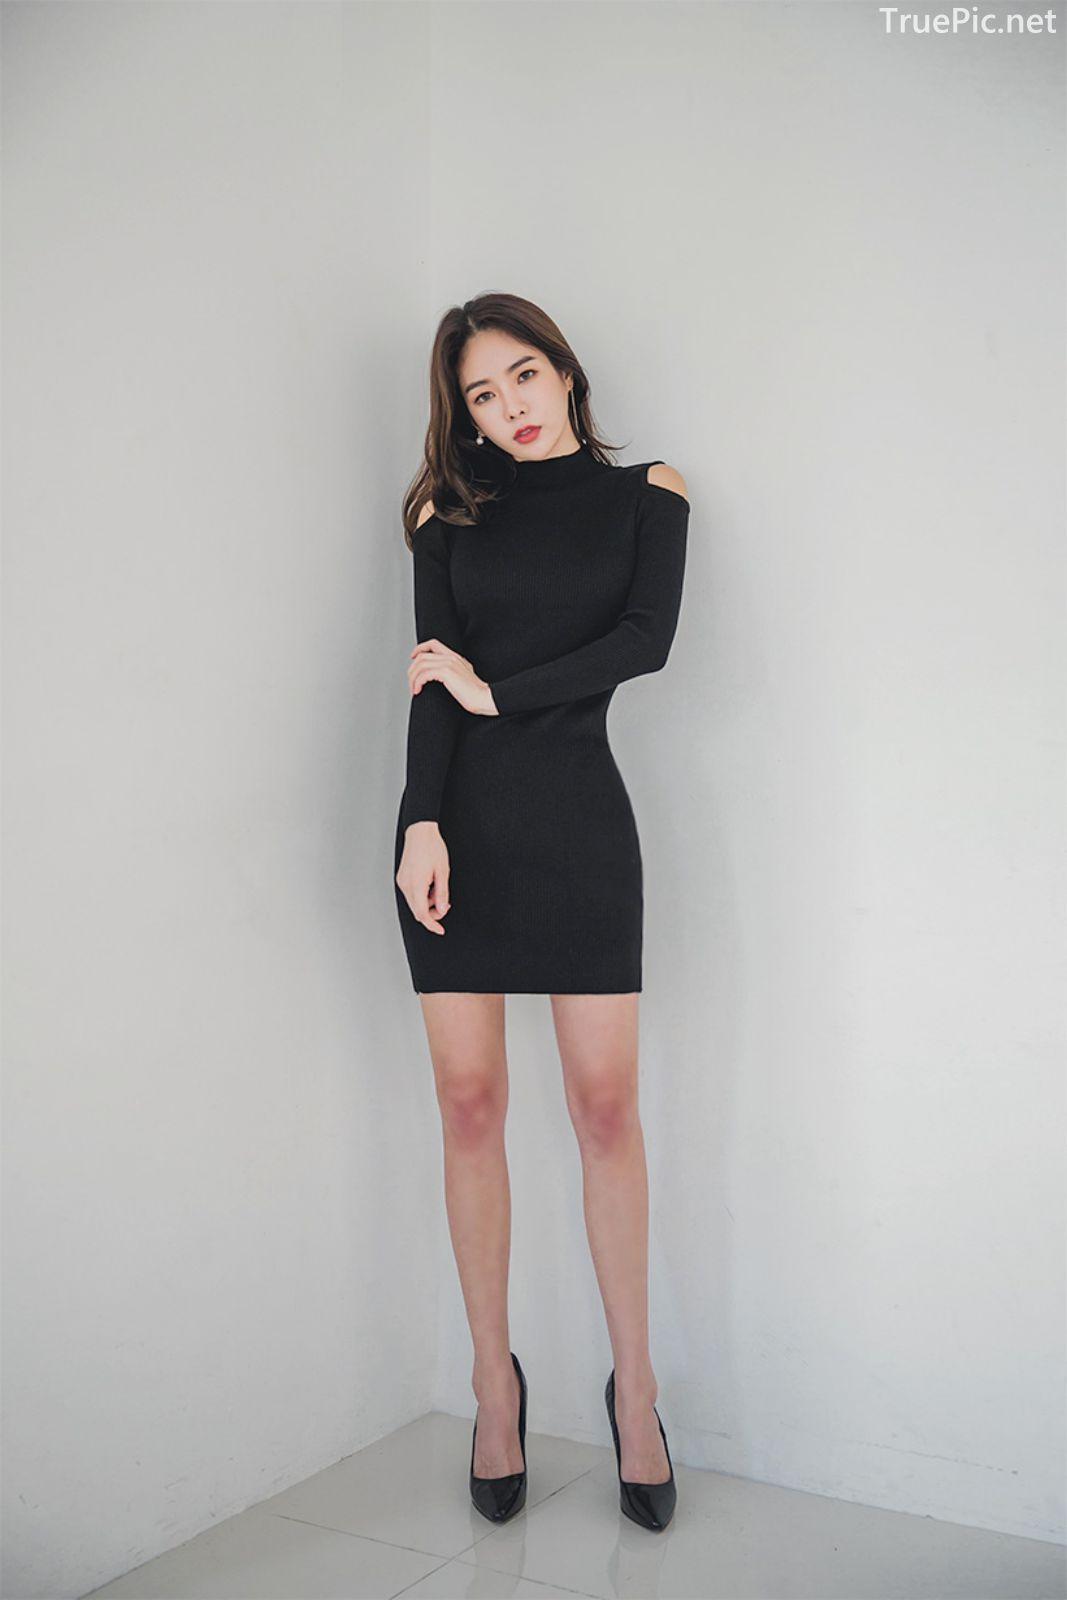 Korean fashion model - An Seo Rin - Woolen office dress collection - TruePic.net - Picture 8